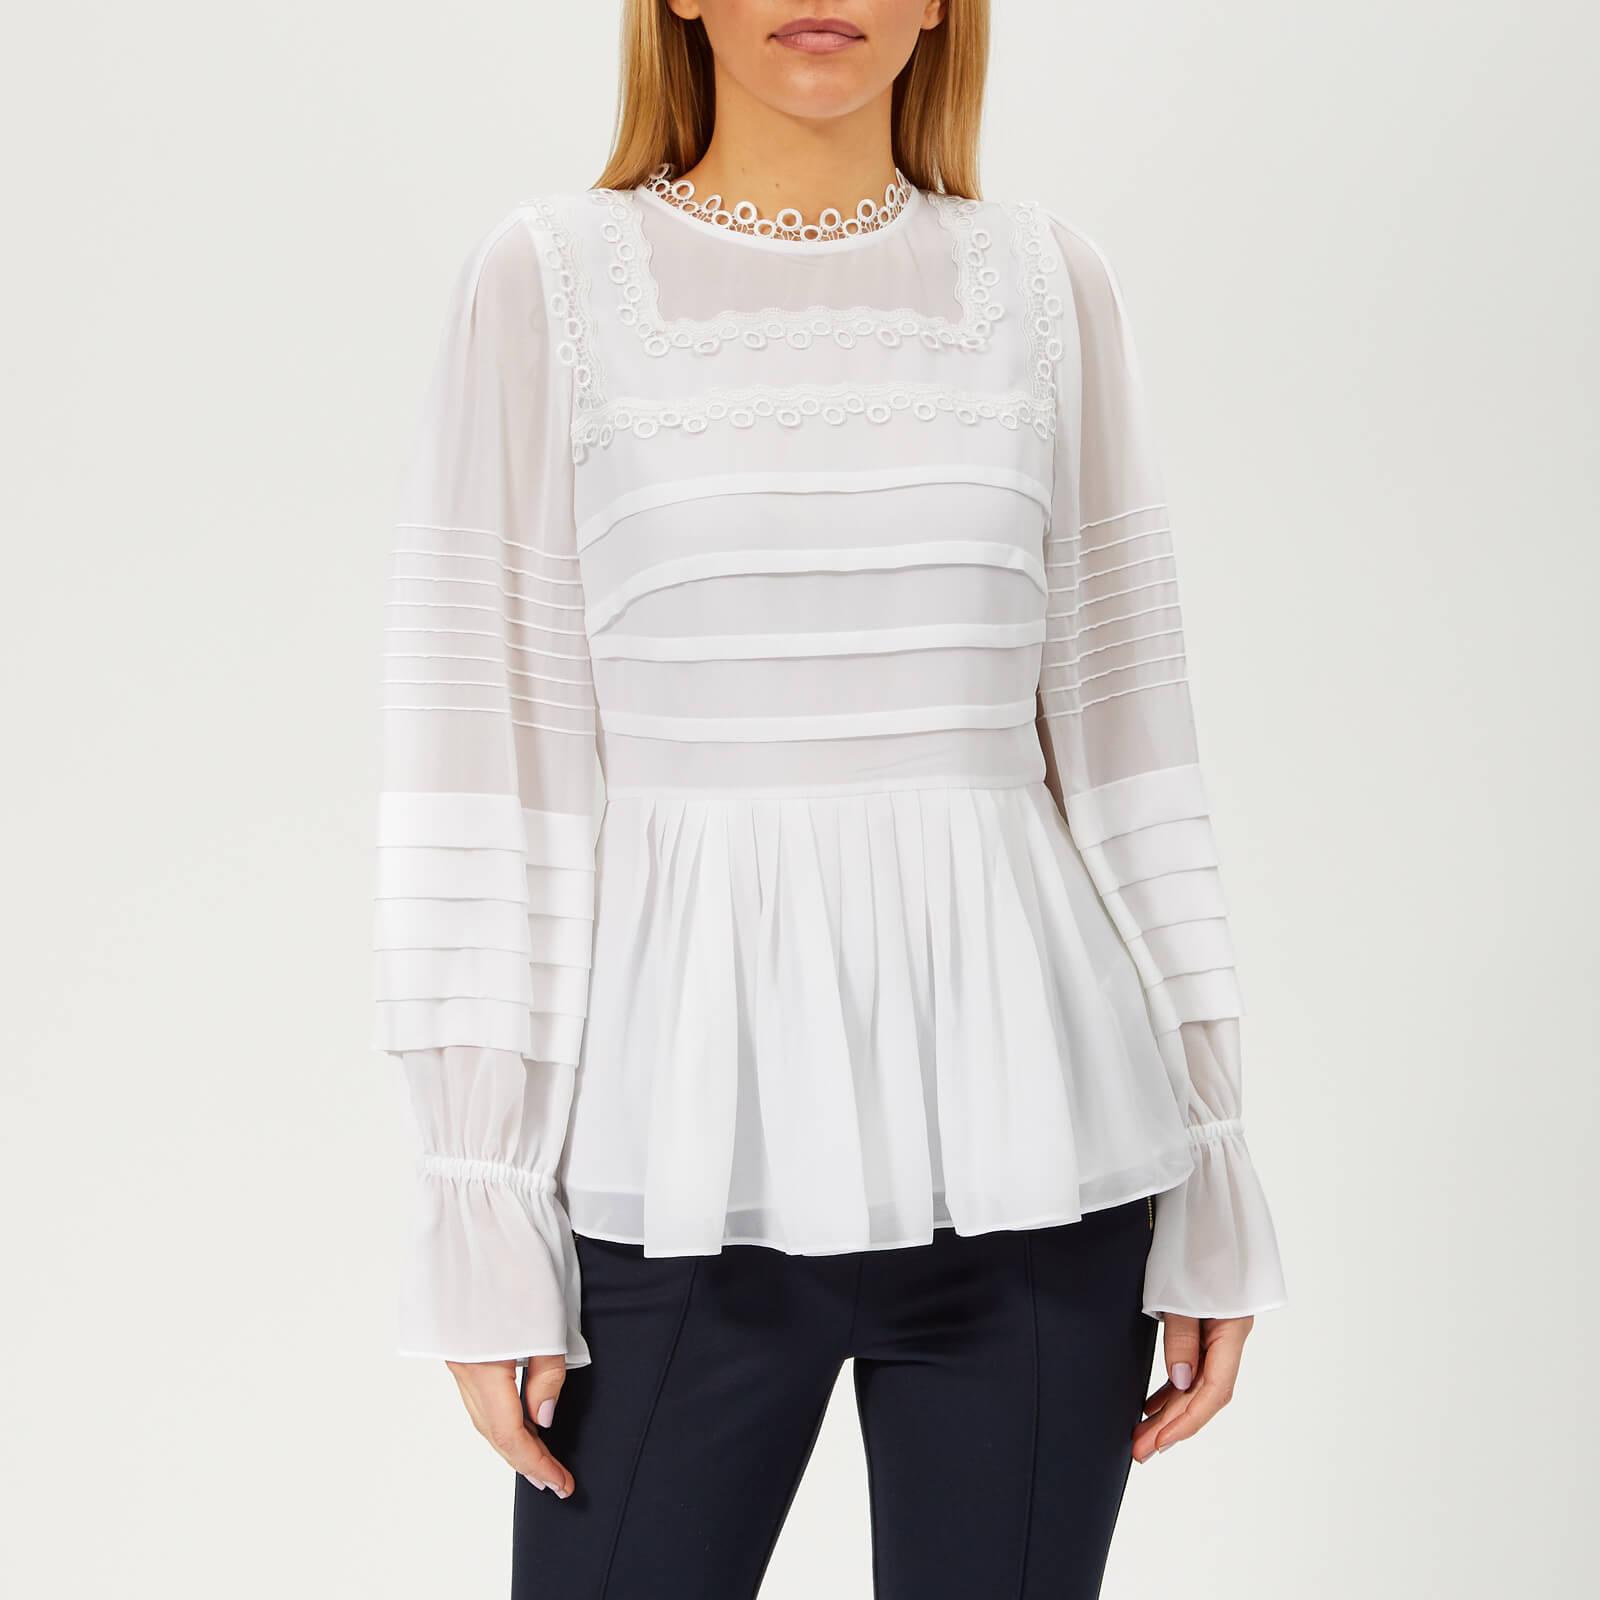 Ted Baker Women's Roobee Pintuck Detailing Long Sleeve Top - White - 4/UK 14 - White